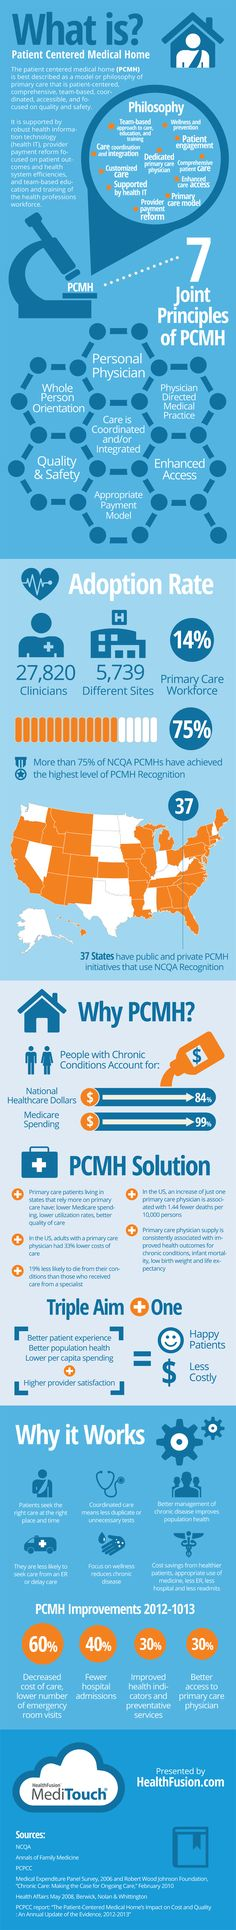 PCMH-Infographic-full-1